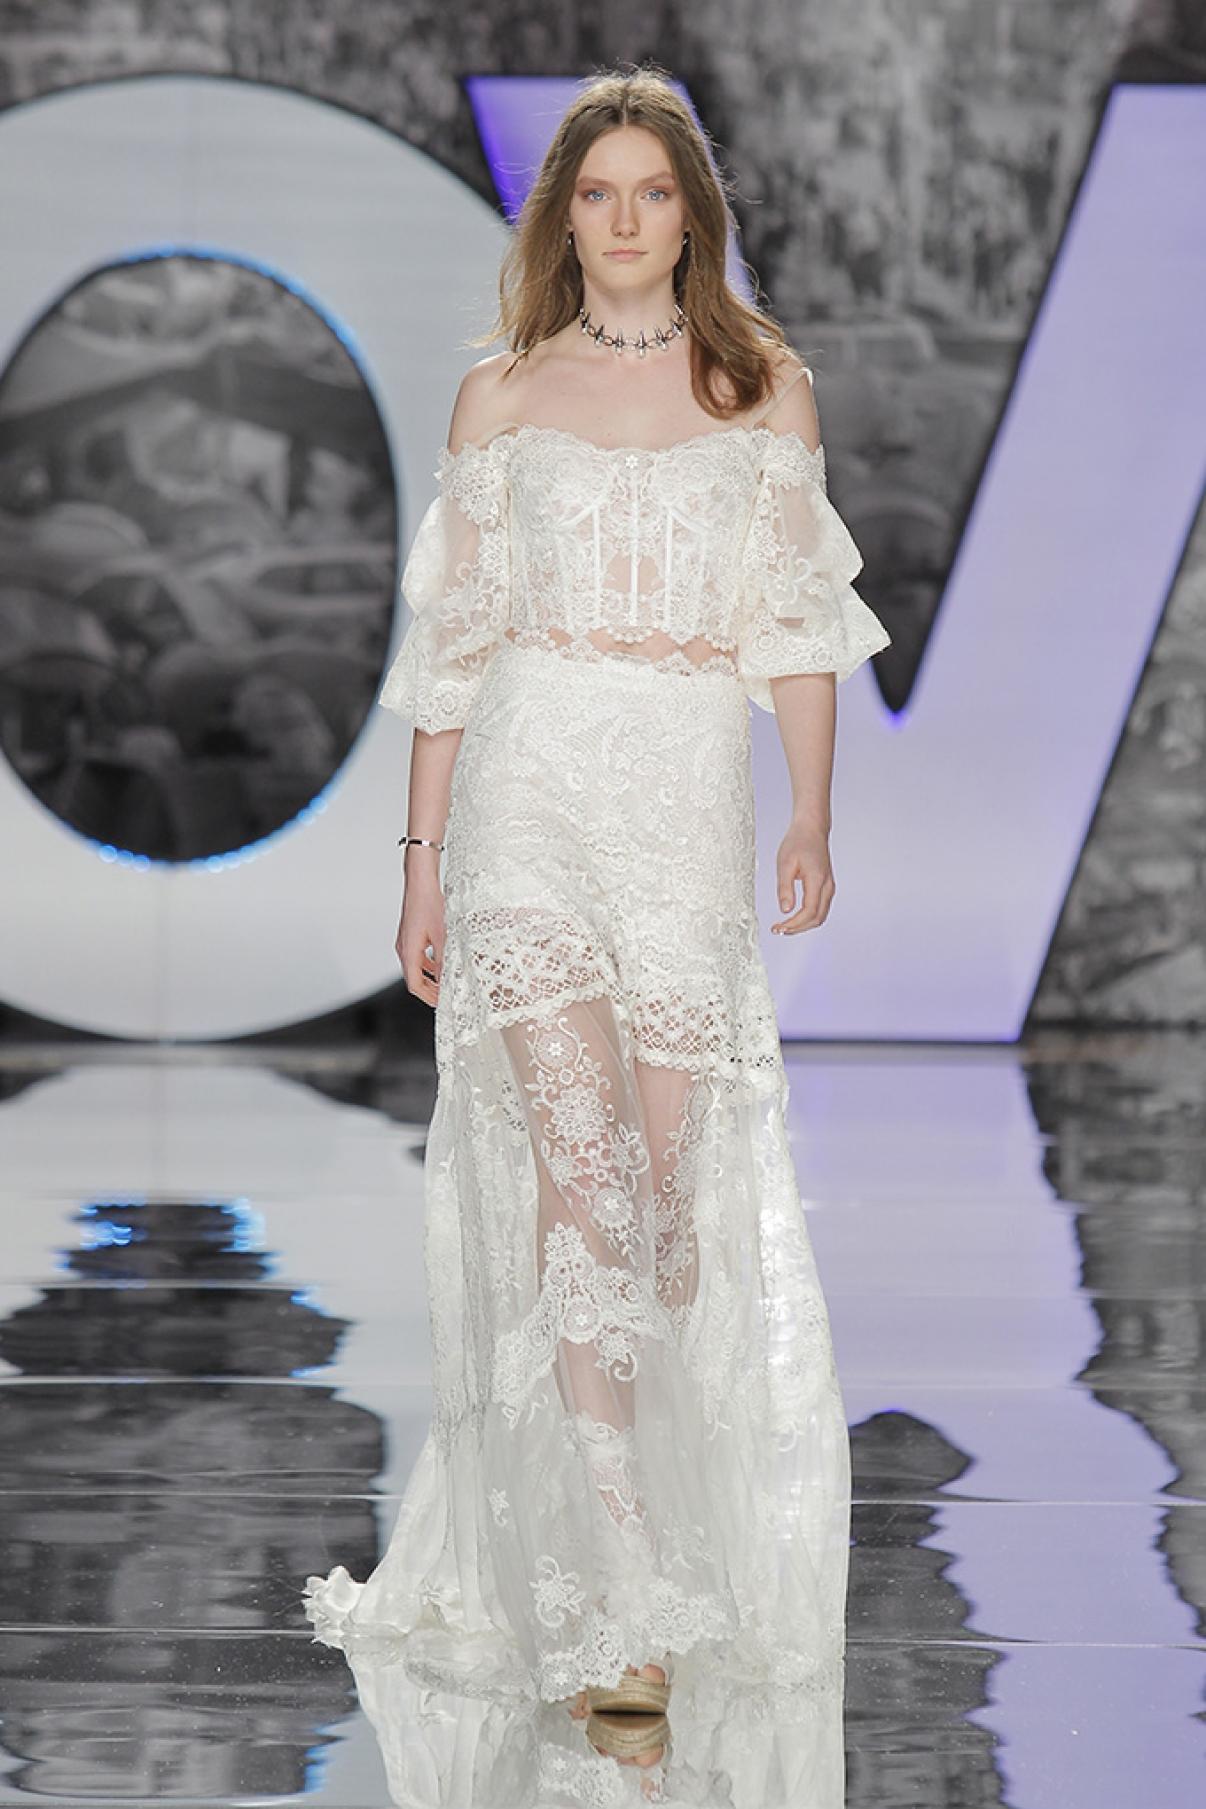 yolancris-weddingdress-bride-boho-chic-folk-wedding-dress-couture-fashion-desing-bohodress-73.jpg